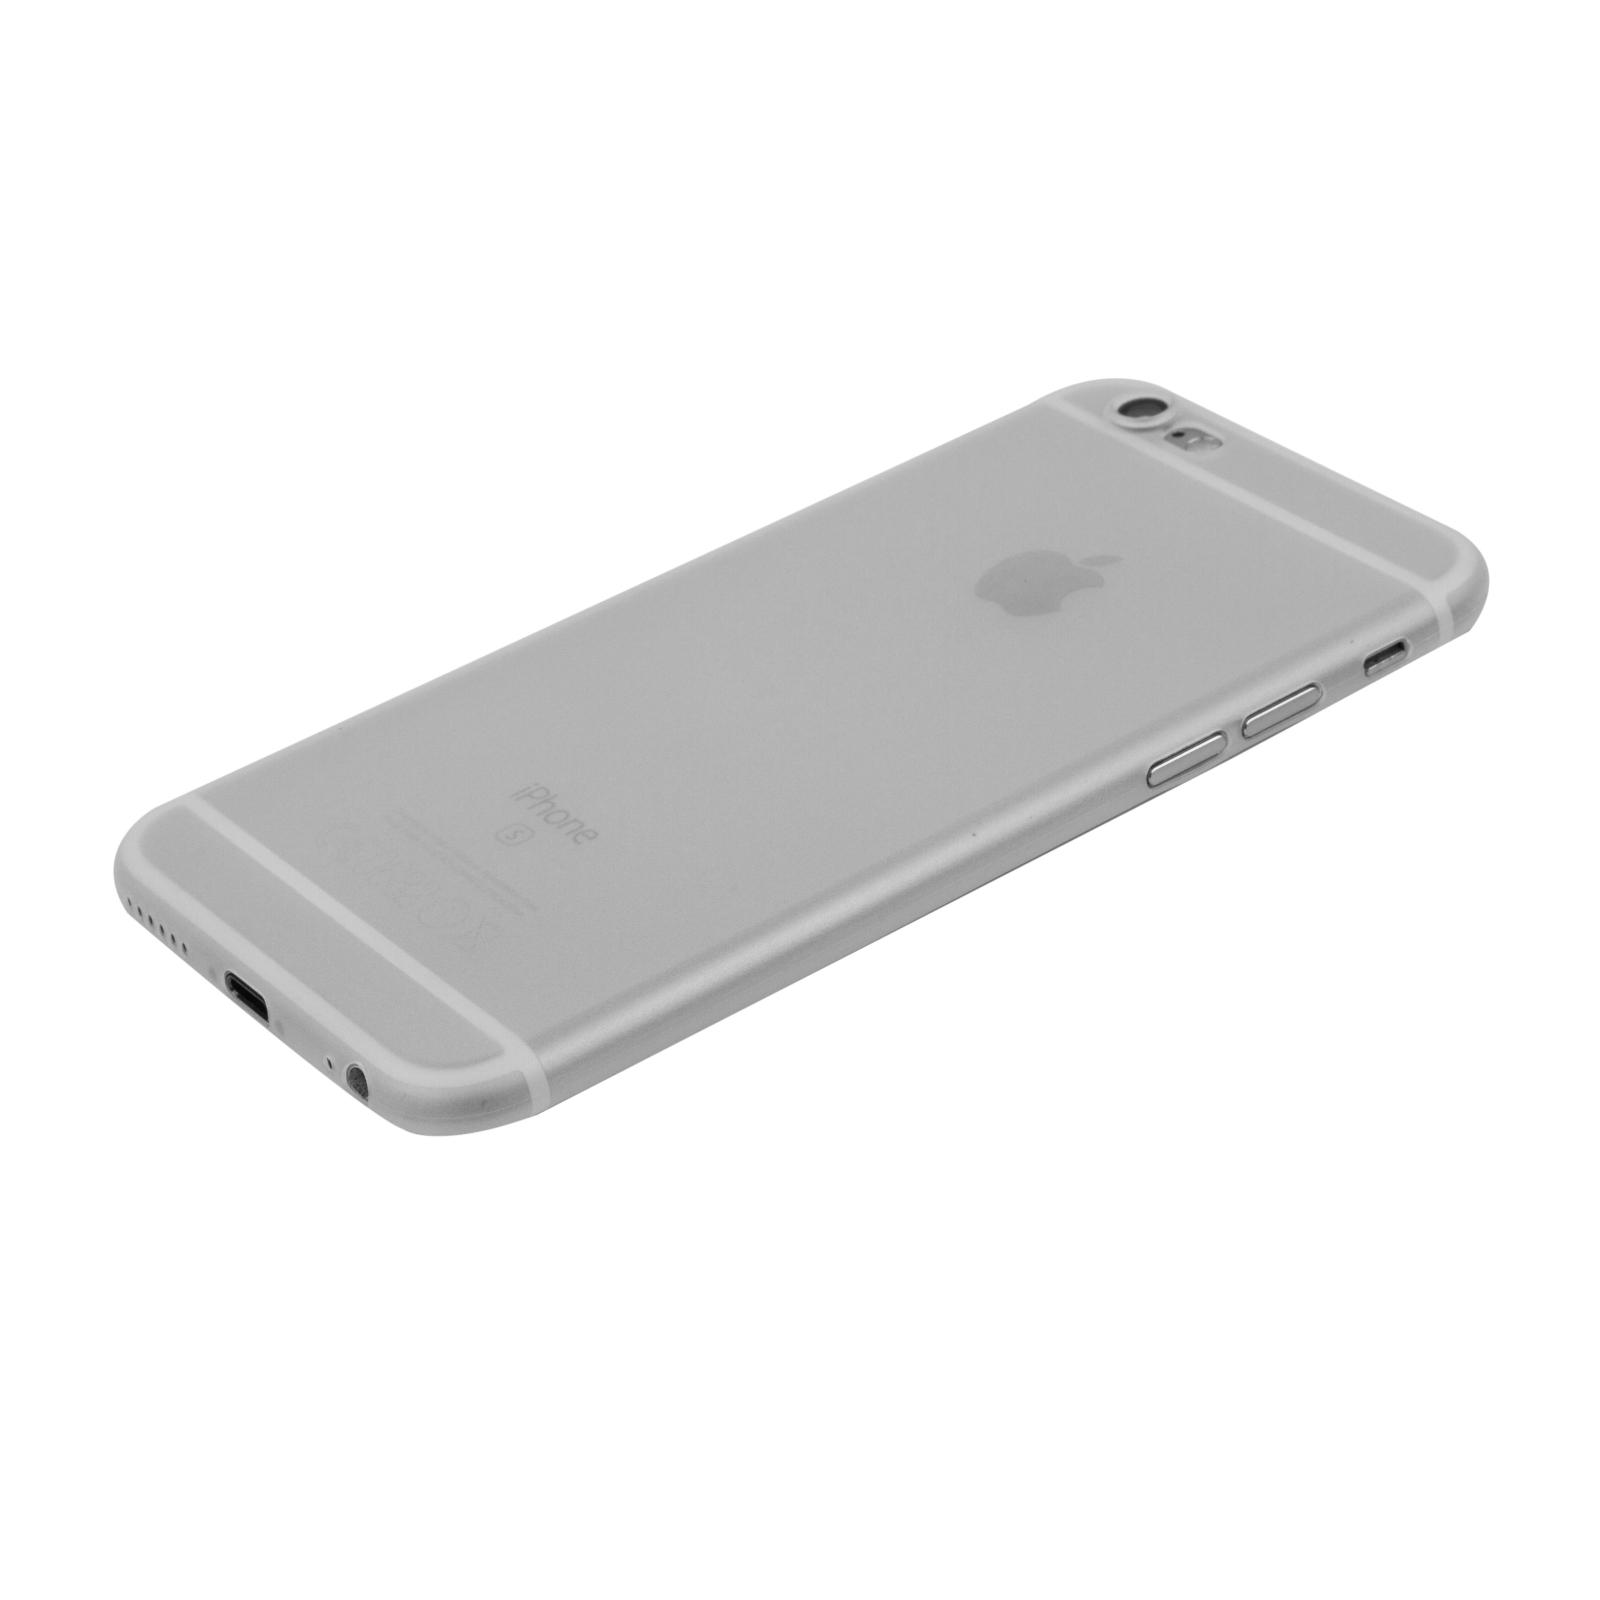 Чехол для моб. телефона MakeFuture Ice Case (PP) для Apple iPhone 6 White (MCI-AI6WH) изображение 4